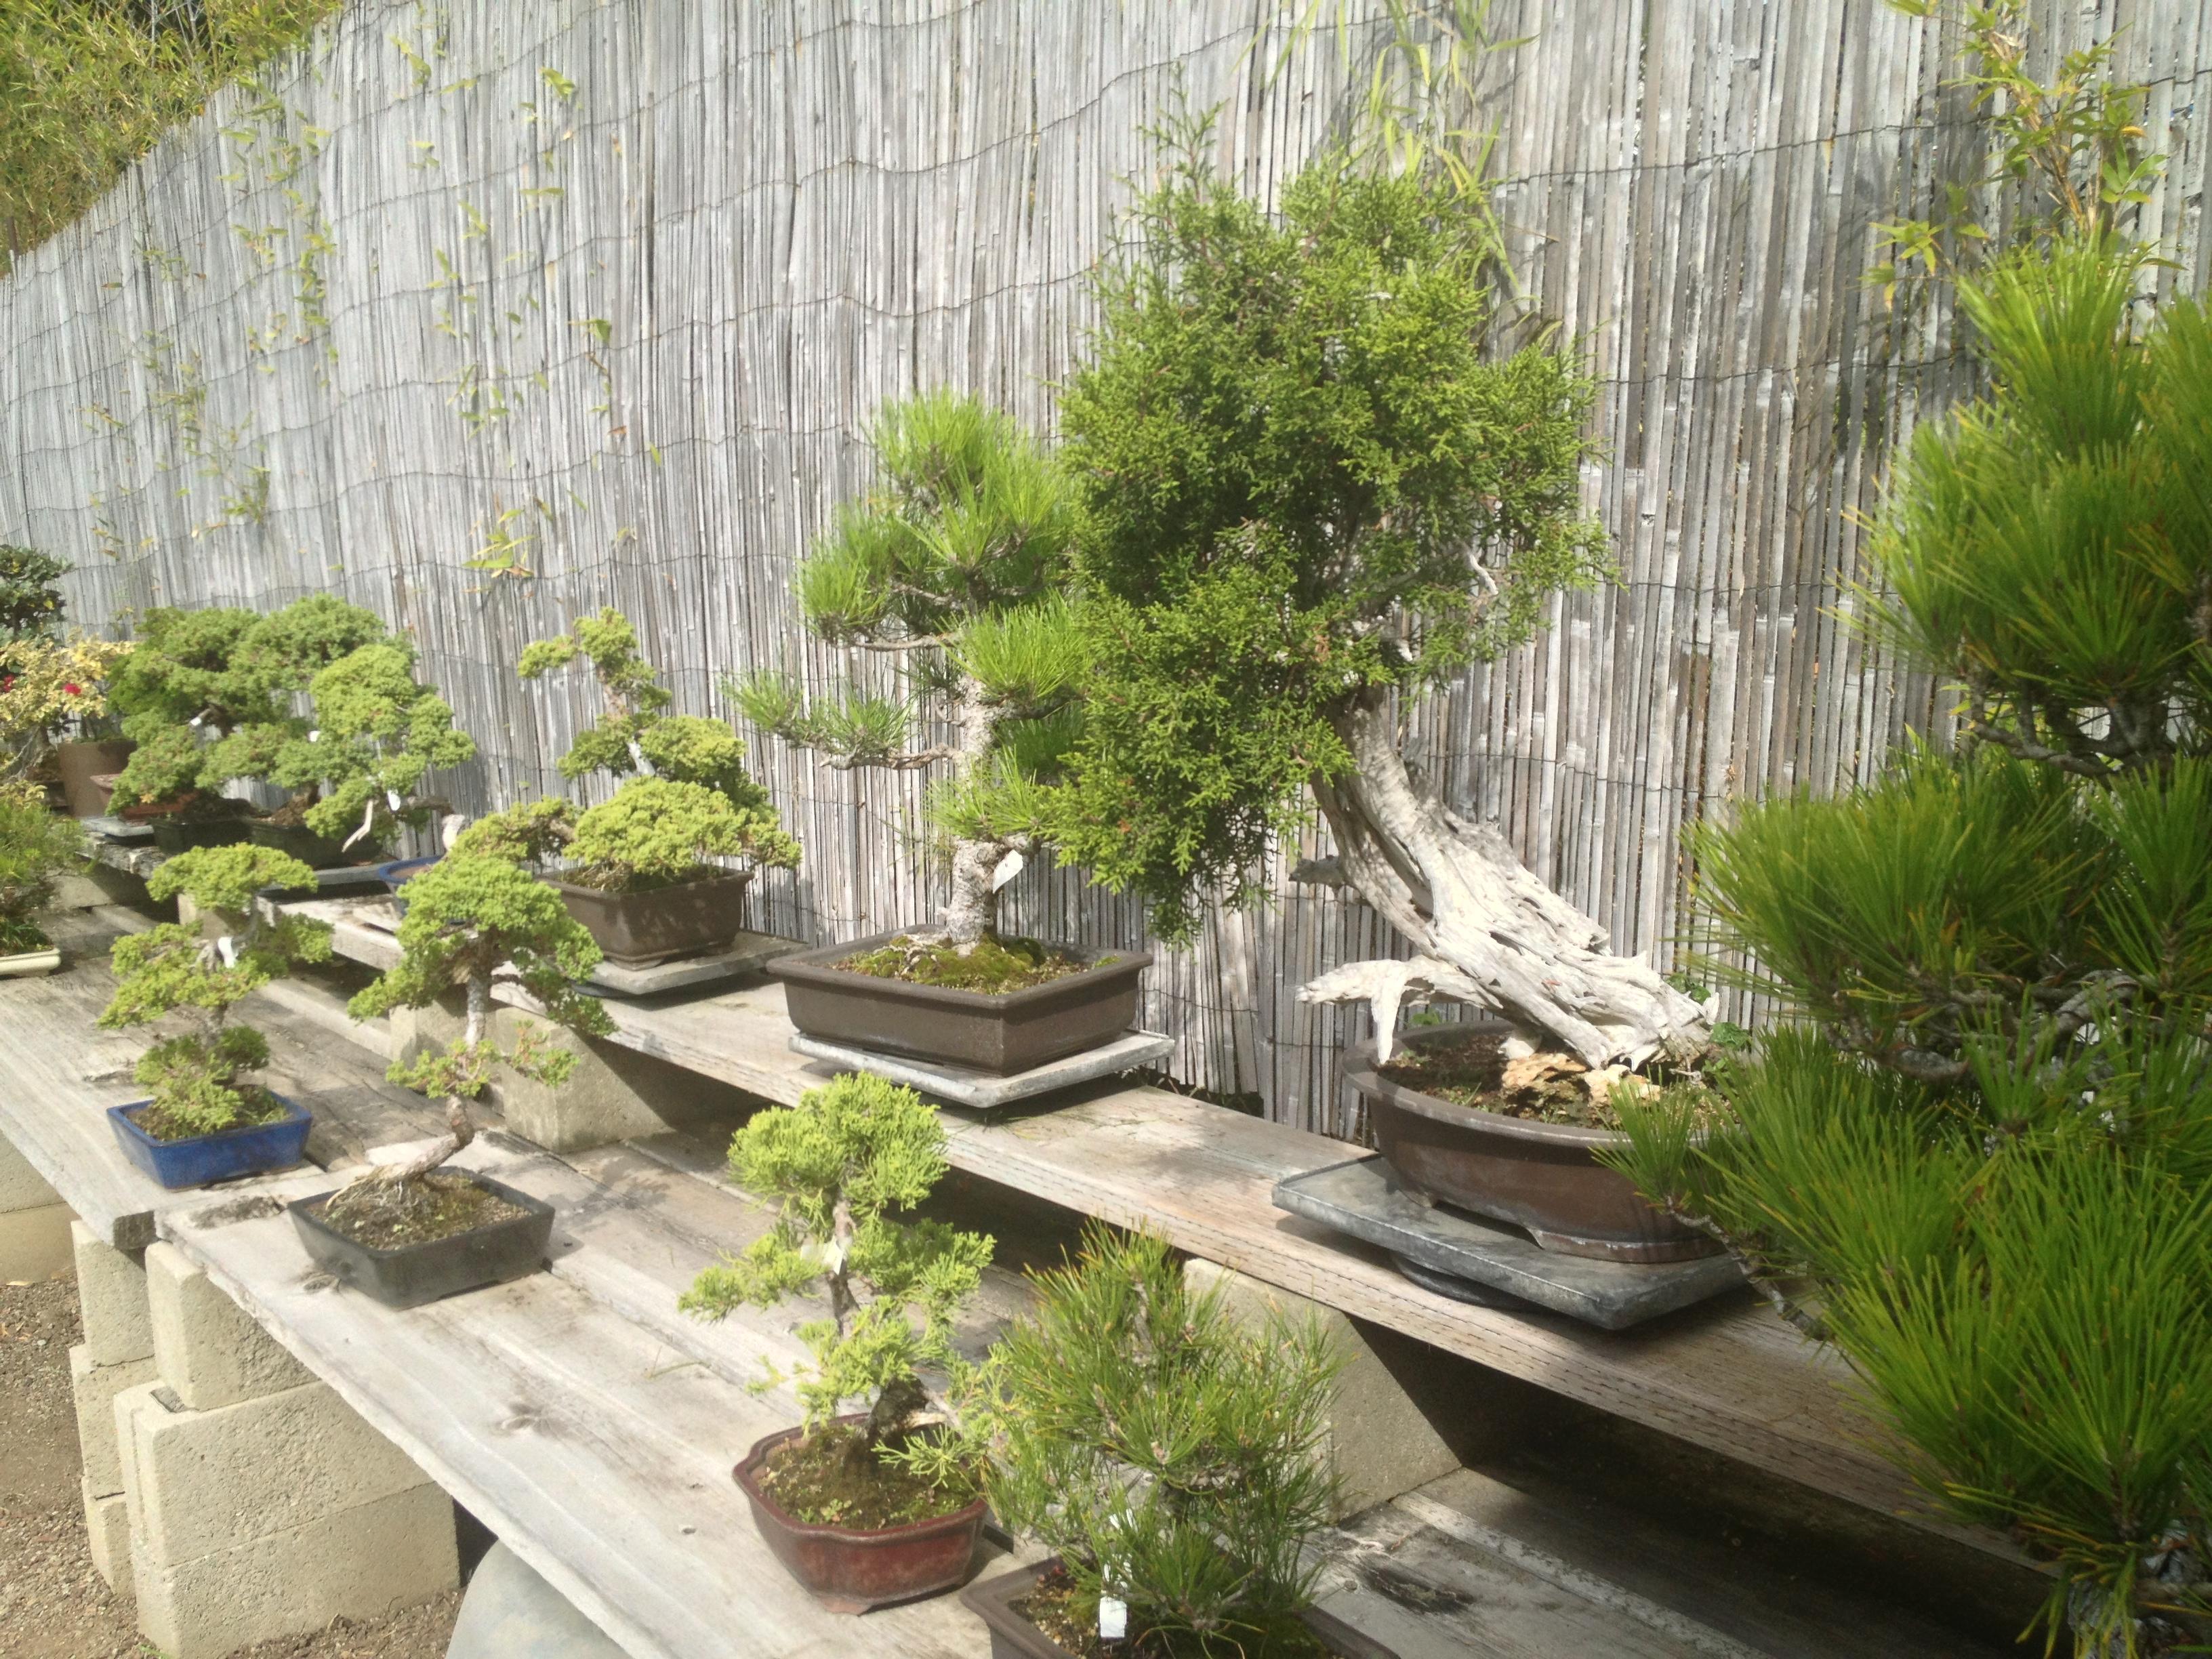 Bonsai Nursery Visits Yamaguchi And Hashimoto The Bonsai Dilettante